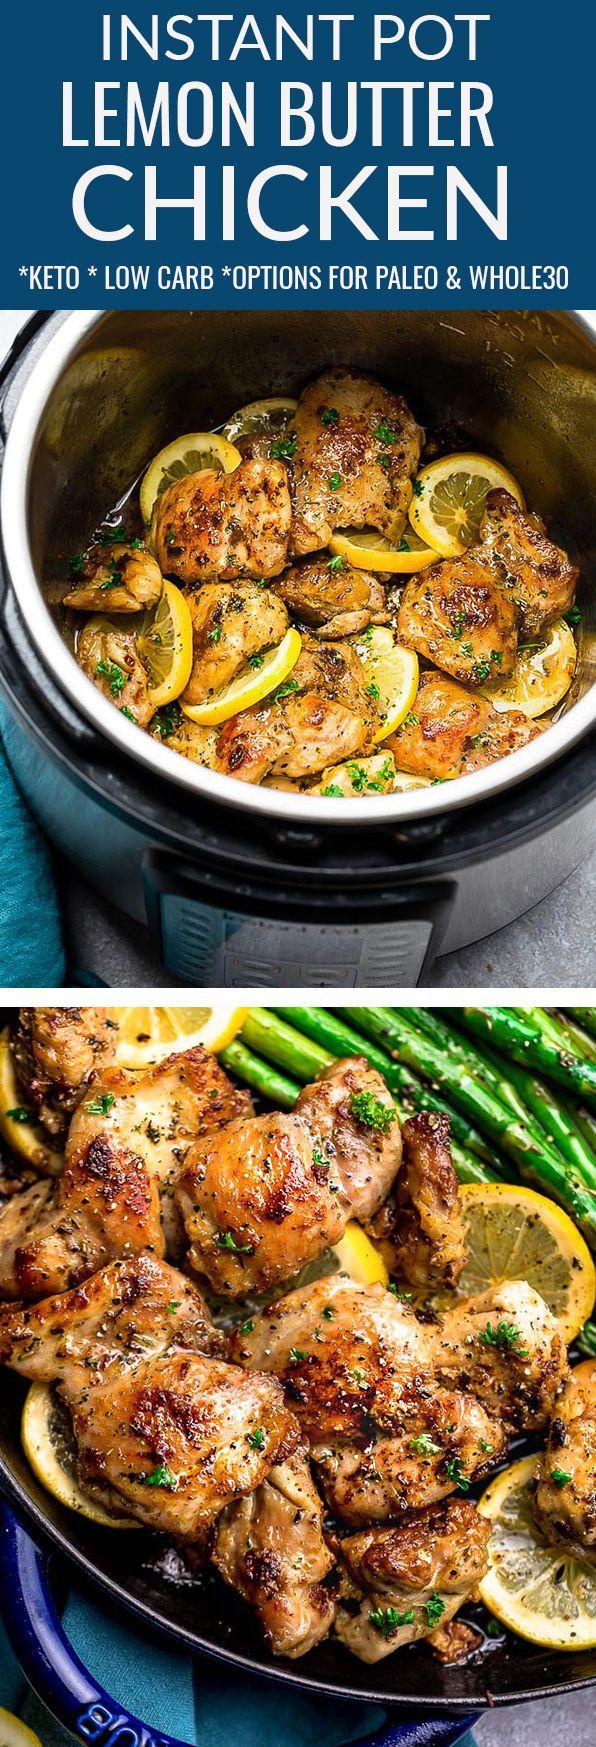 Instant Pot Lemon Butter Chicken | Easy One Pan Chicken Dinner Recipe #instantpotchickenrecipes